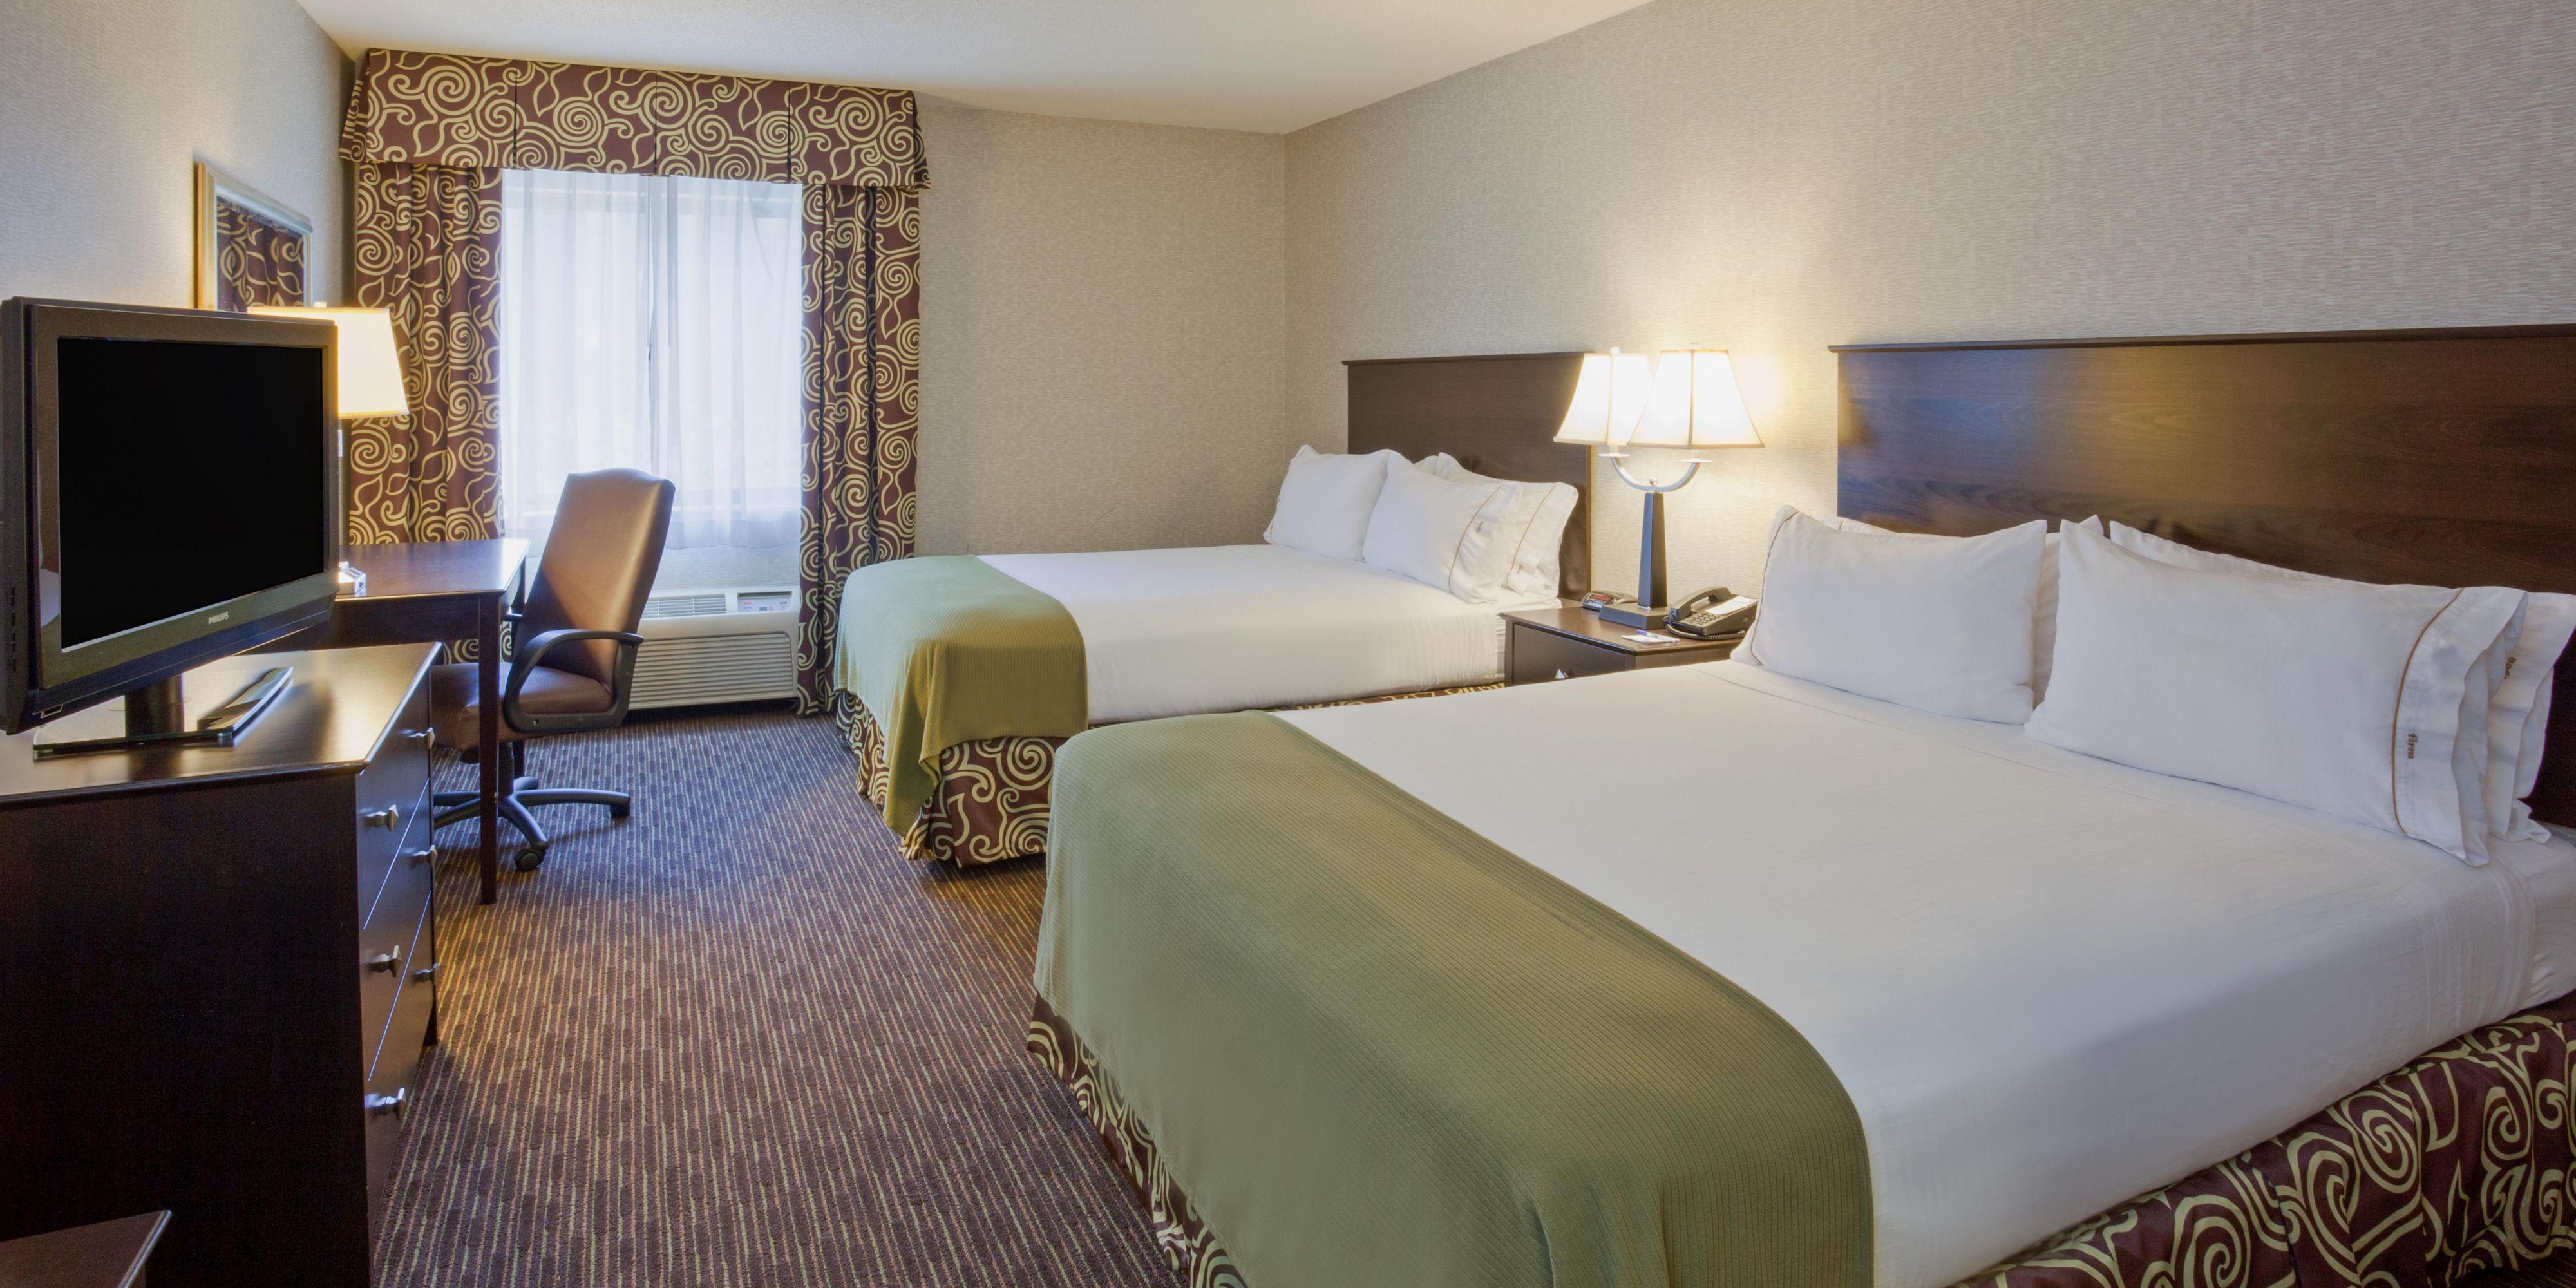 suites vista robins pinterest mn romantic tub ga jacuzzi suite inn warner hot pin